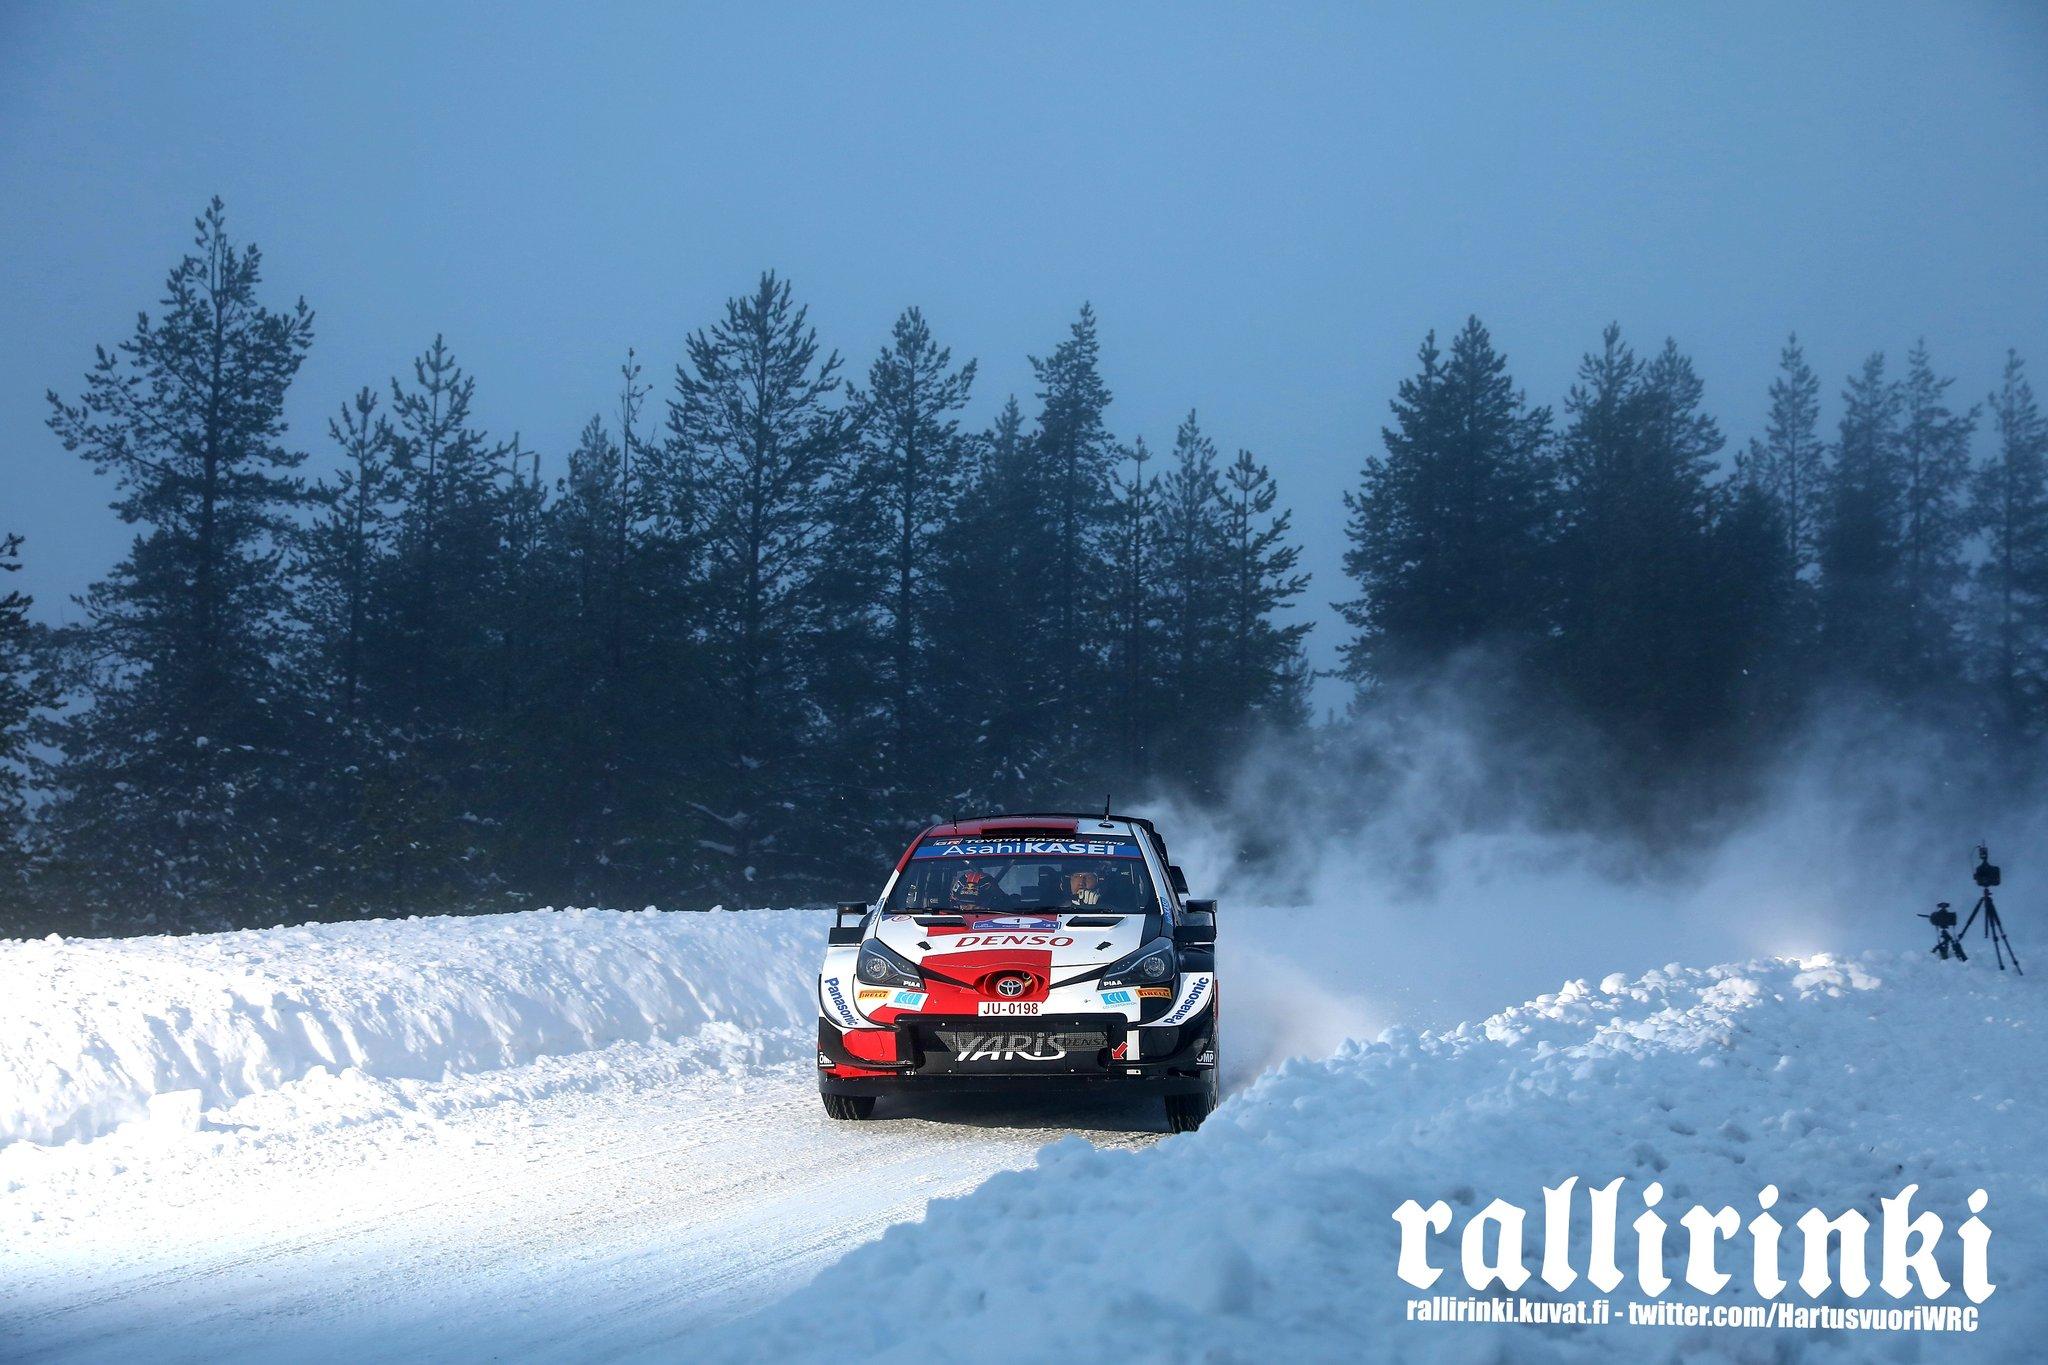 WRC: Arctic Rally Finland - Powered by CapitalBox [26-28 Febrero] - Página 2 EvIgyn_WYAUPBKl?format=jpg&name=large